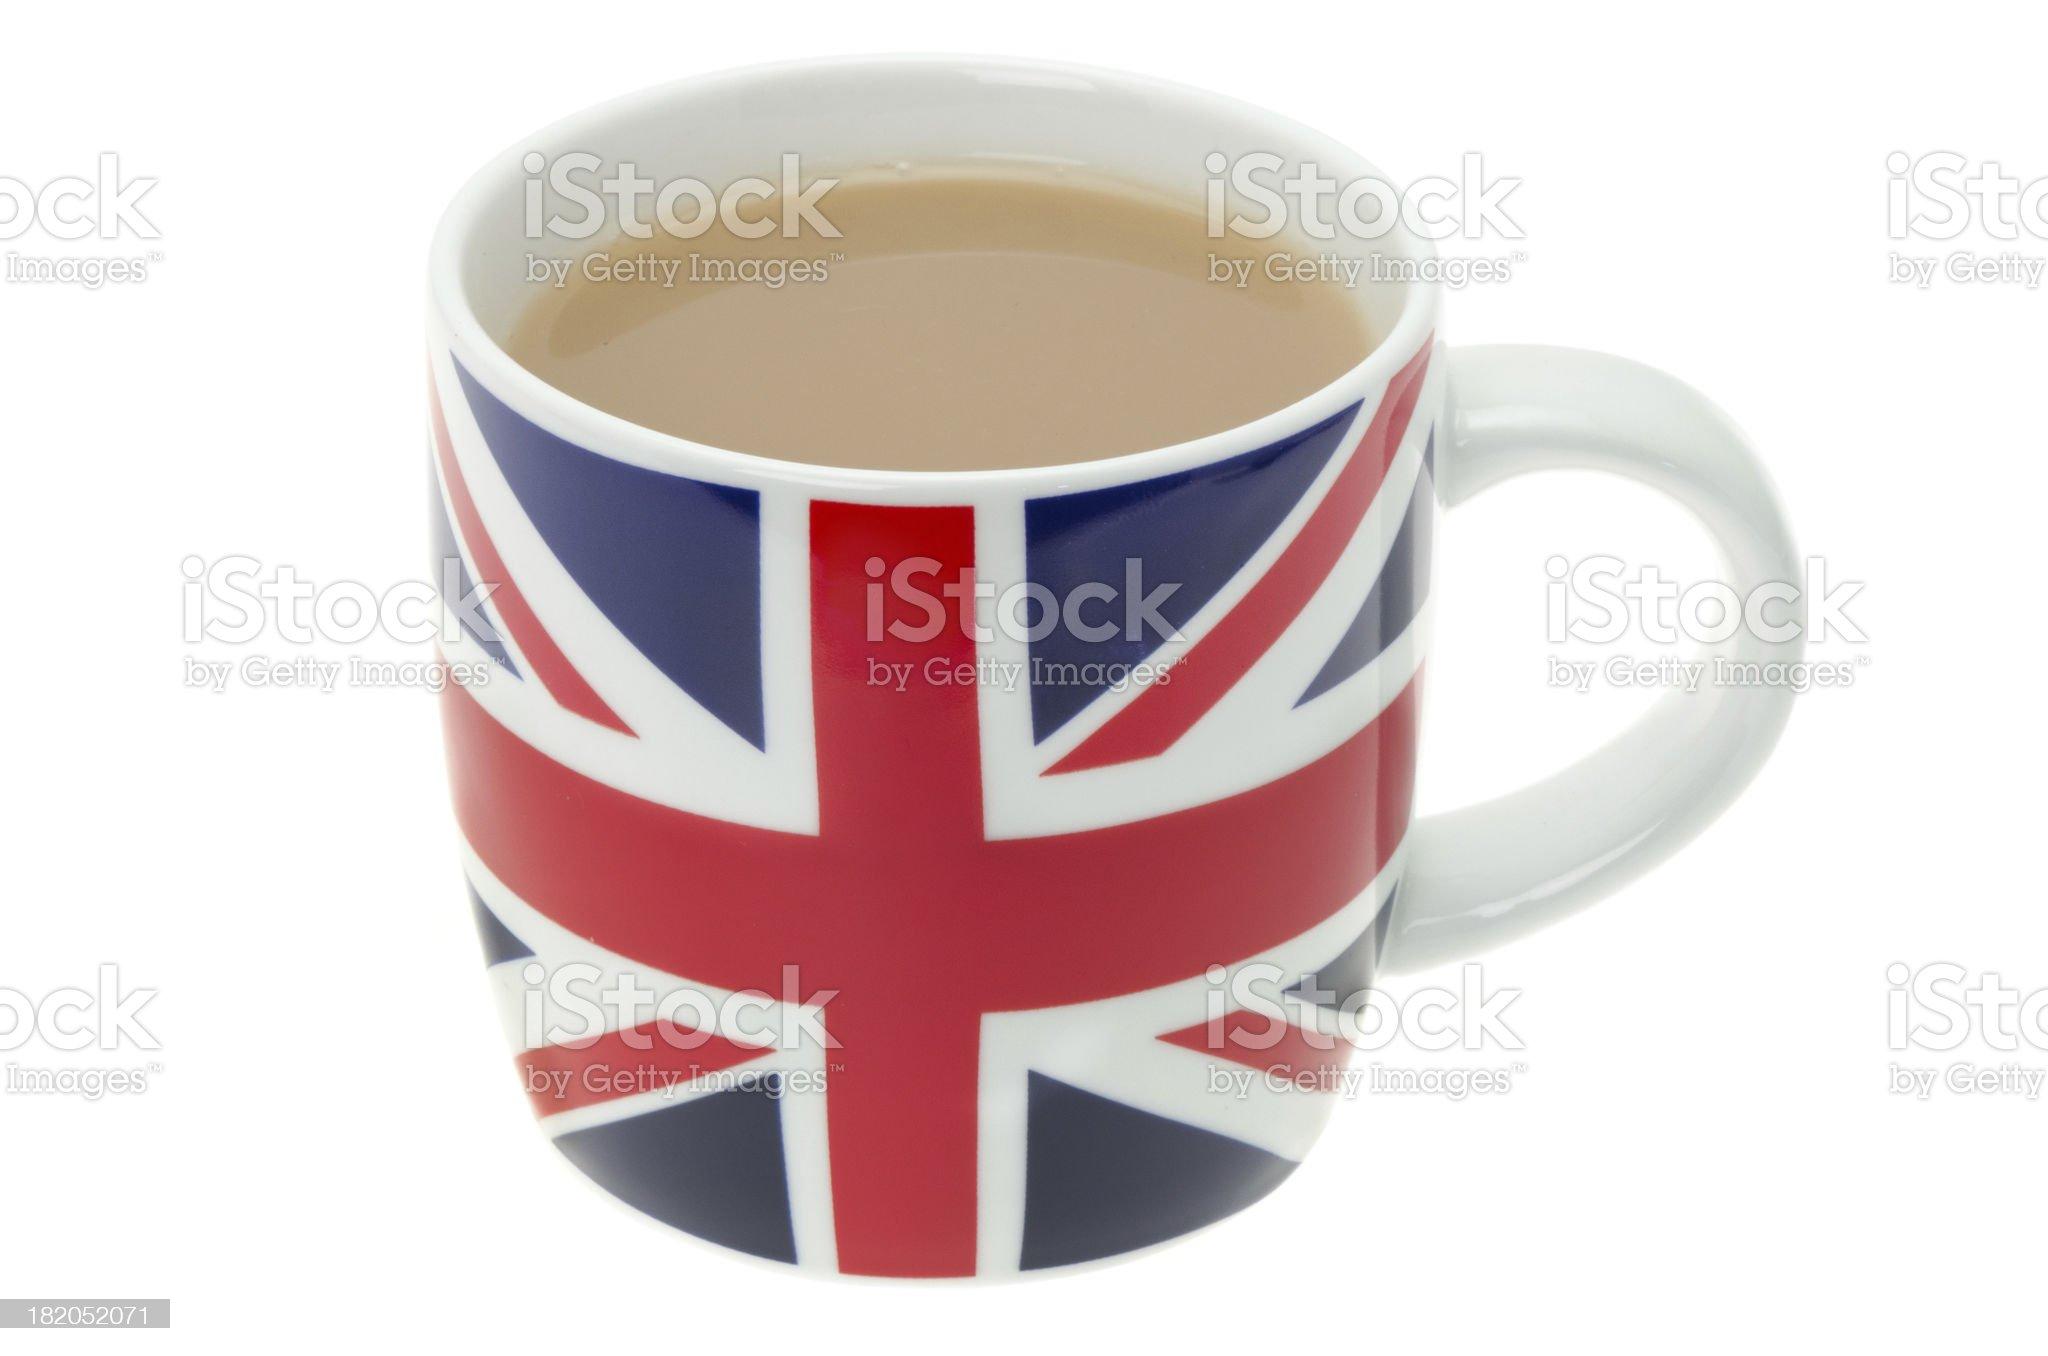 British mug full of hot tea royalty-free stock photo